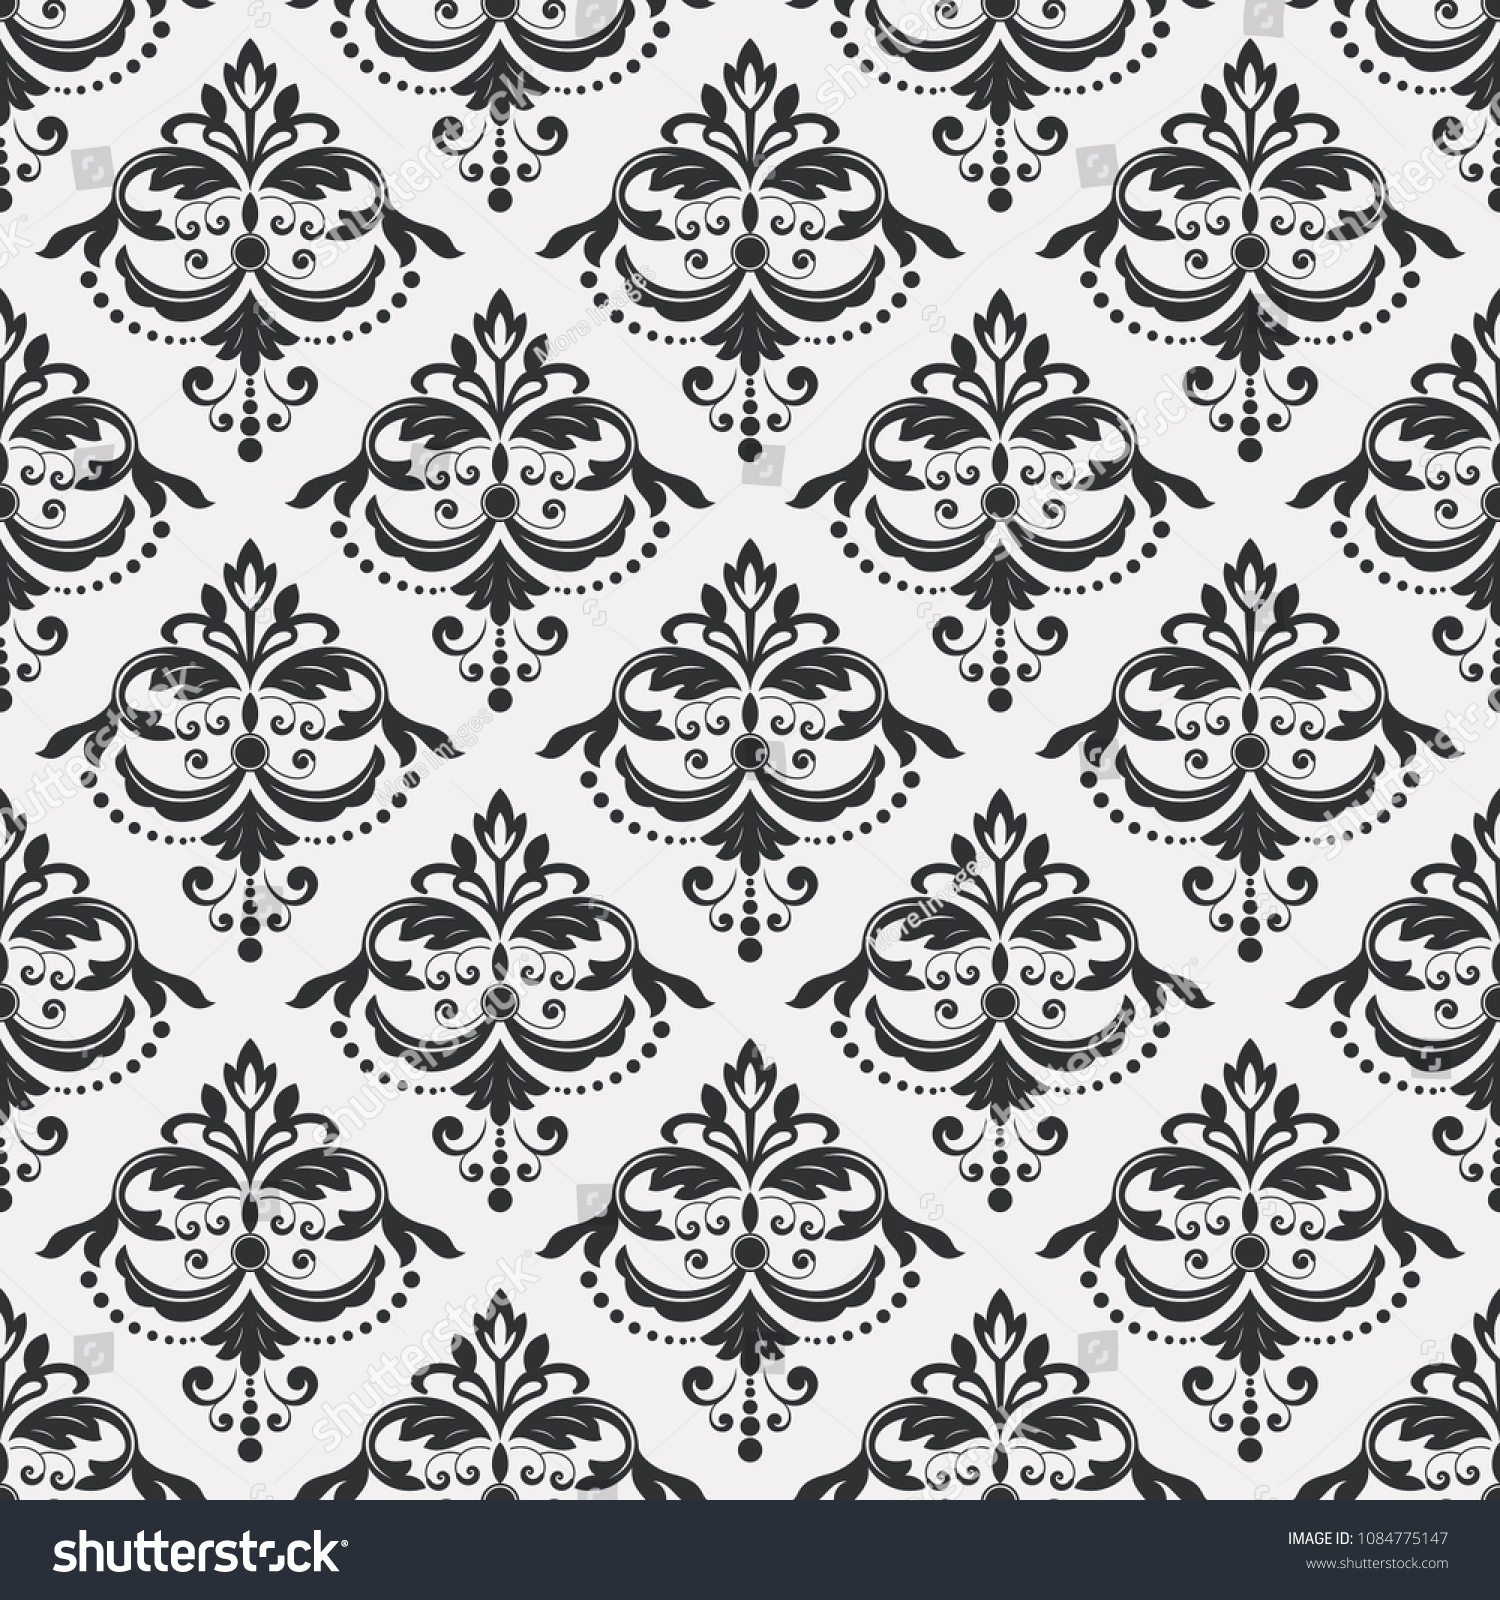 Seamless Black White Floral Wallpaper Vector Stock Vector Royalty